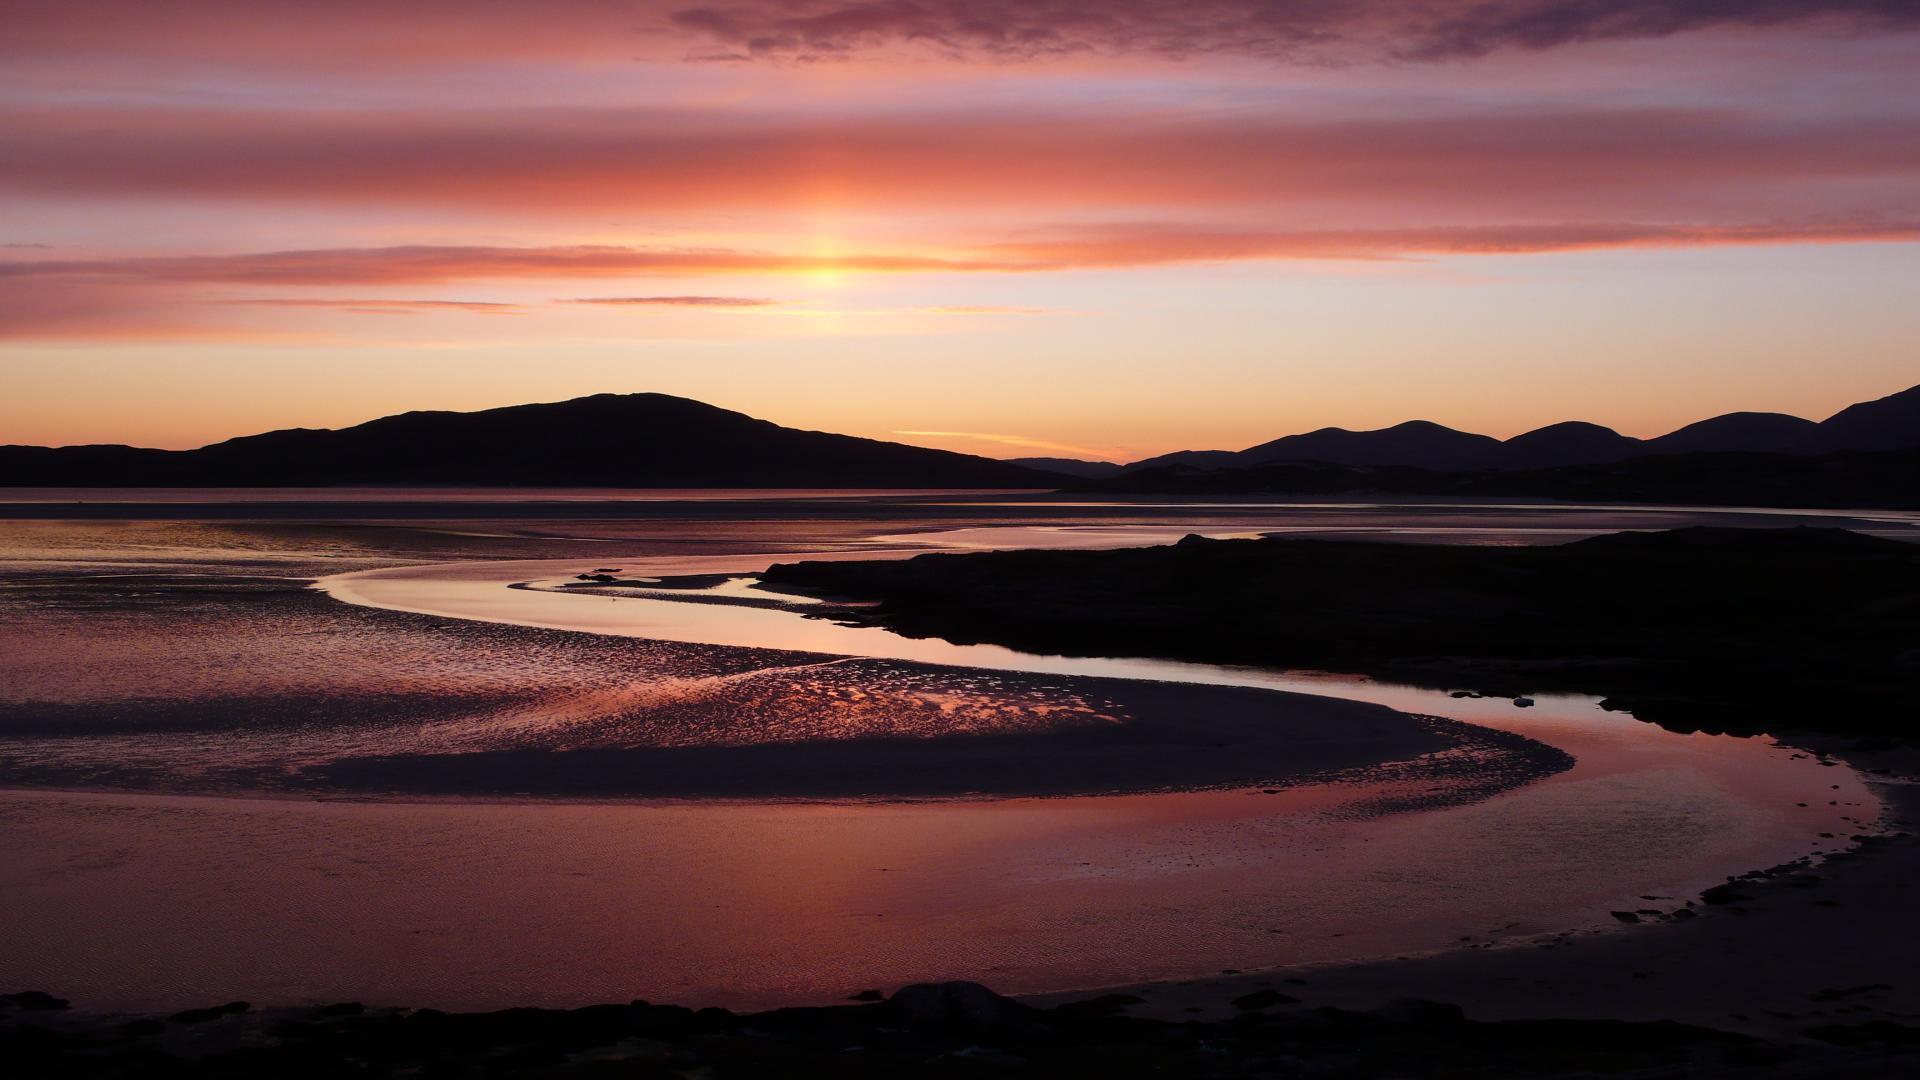 Seilbost Sonnenuntergang